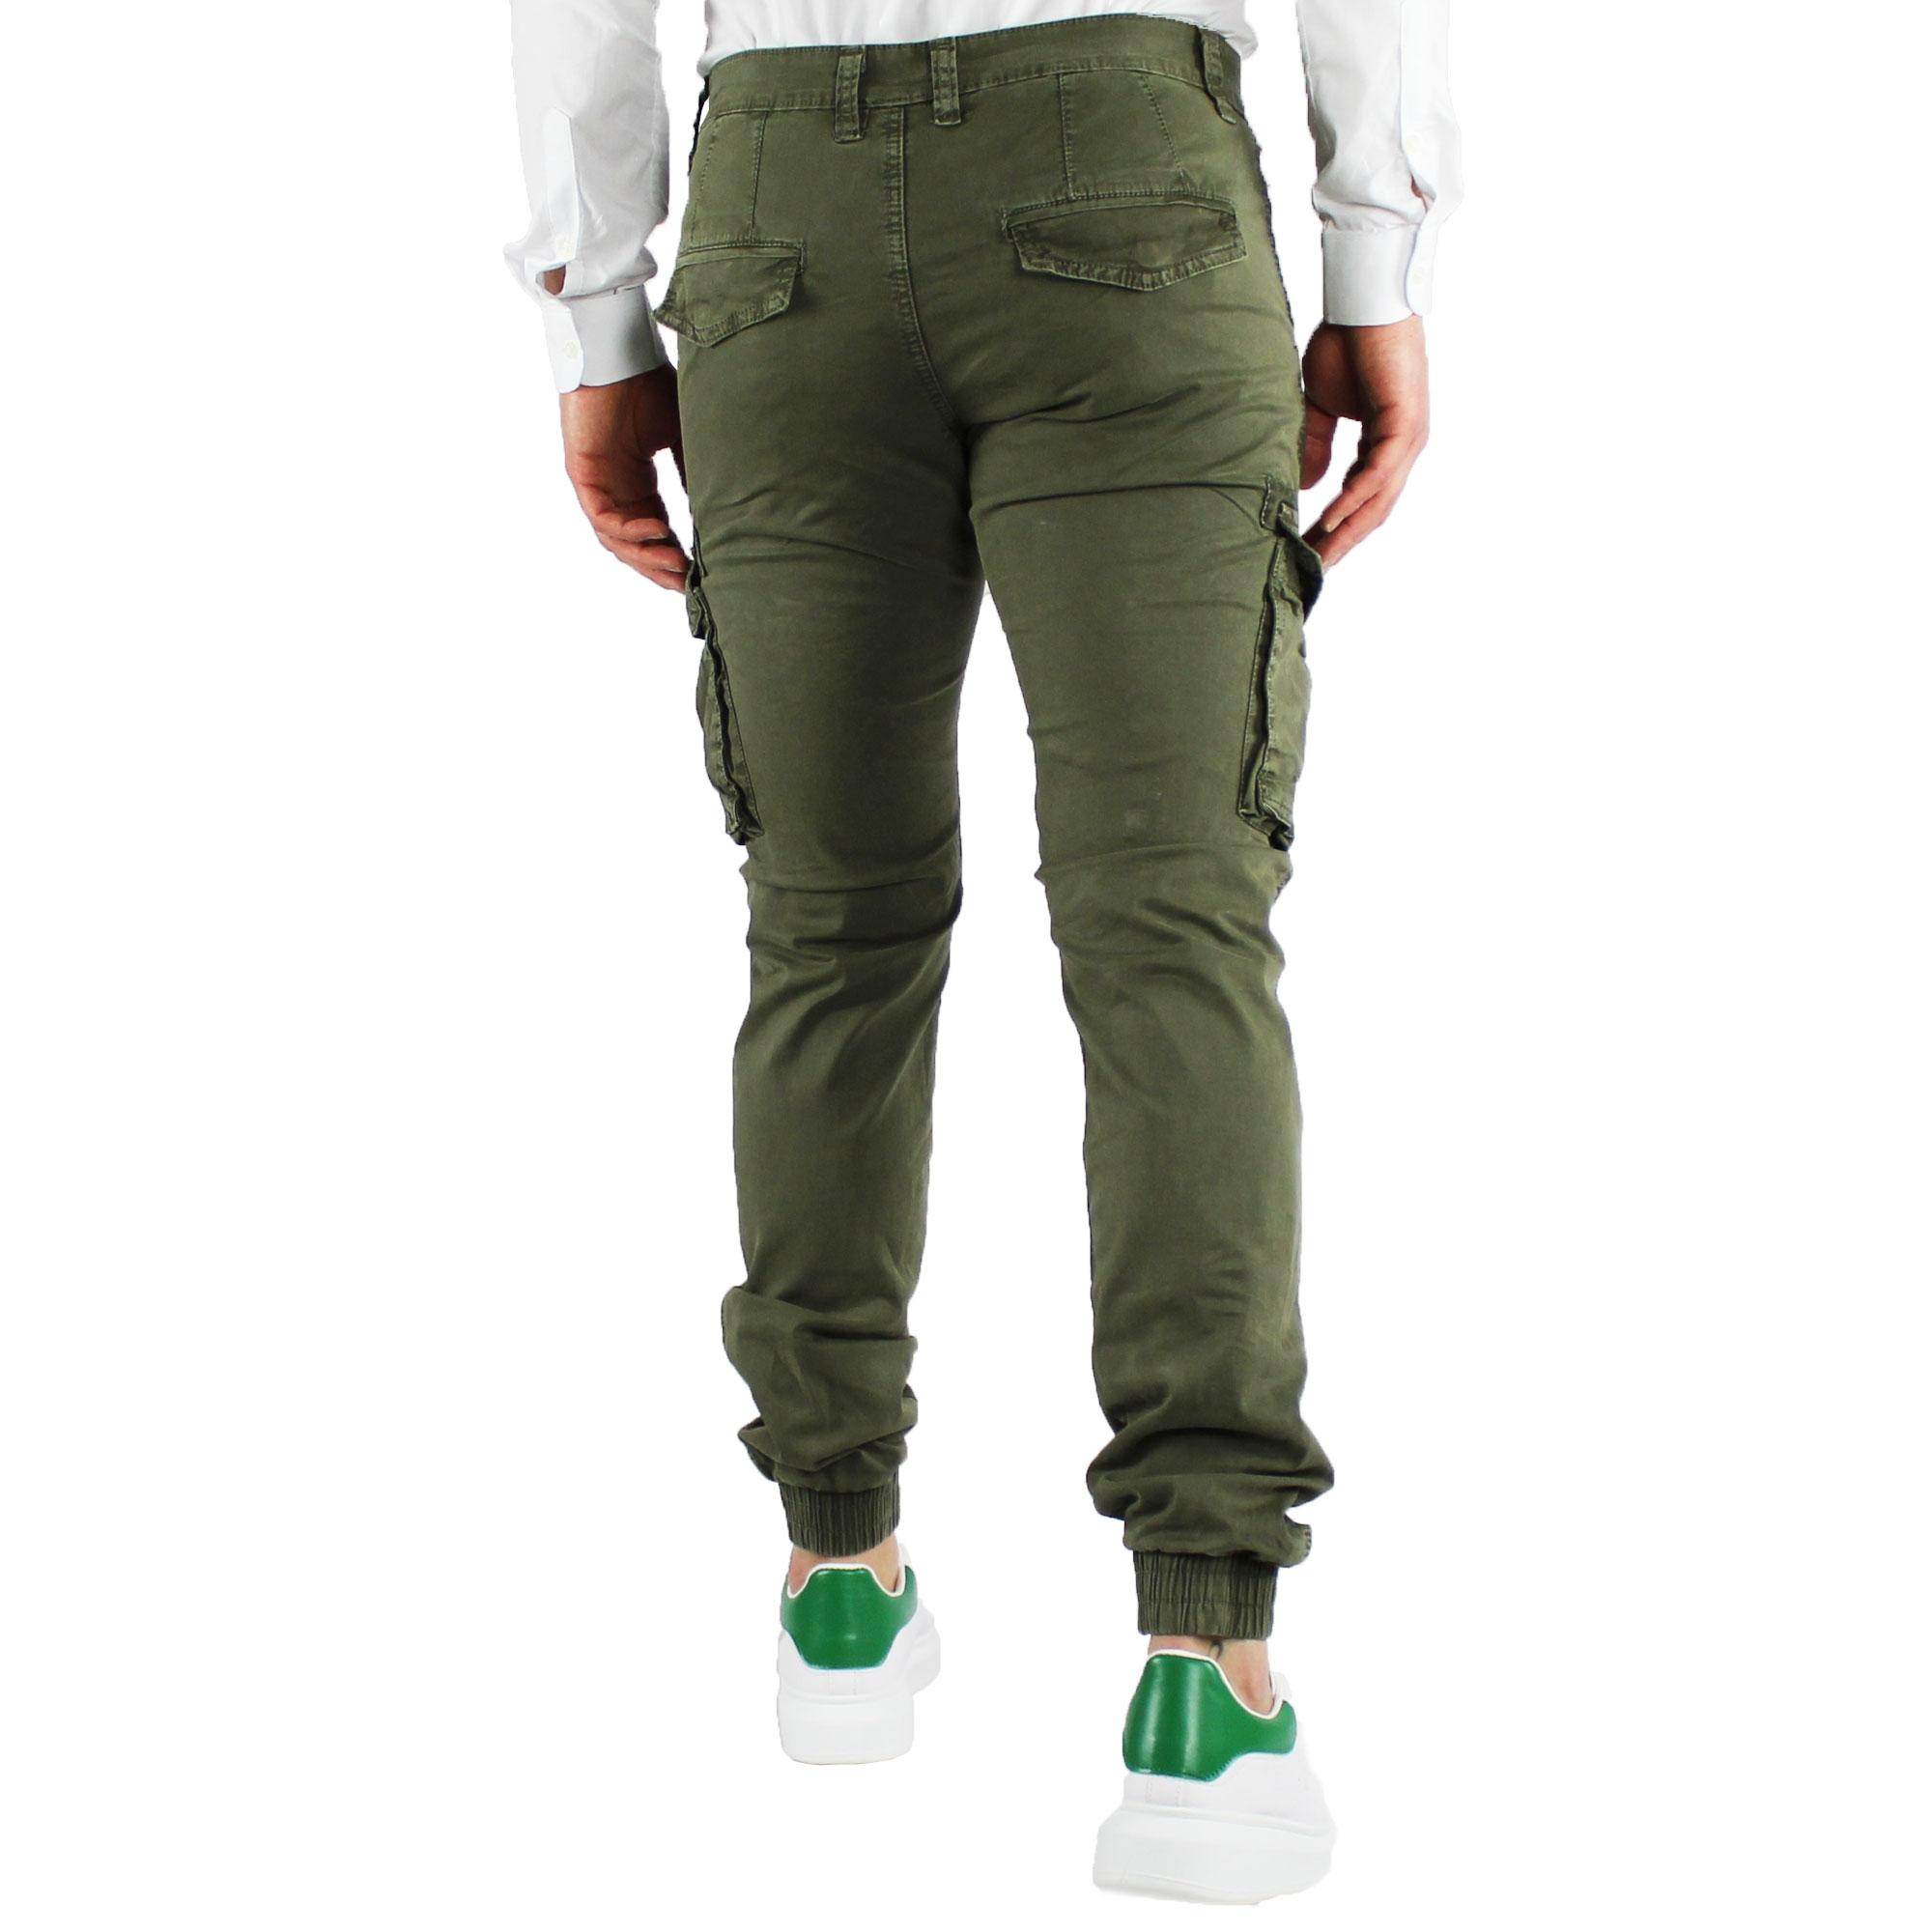 Pantaloni-Uomo-Cargo-Invernali-Pantalone-Tasche-Laterali-SlimFit-Verde-Blu-Fango miniatura 8